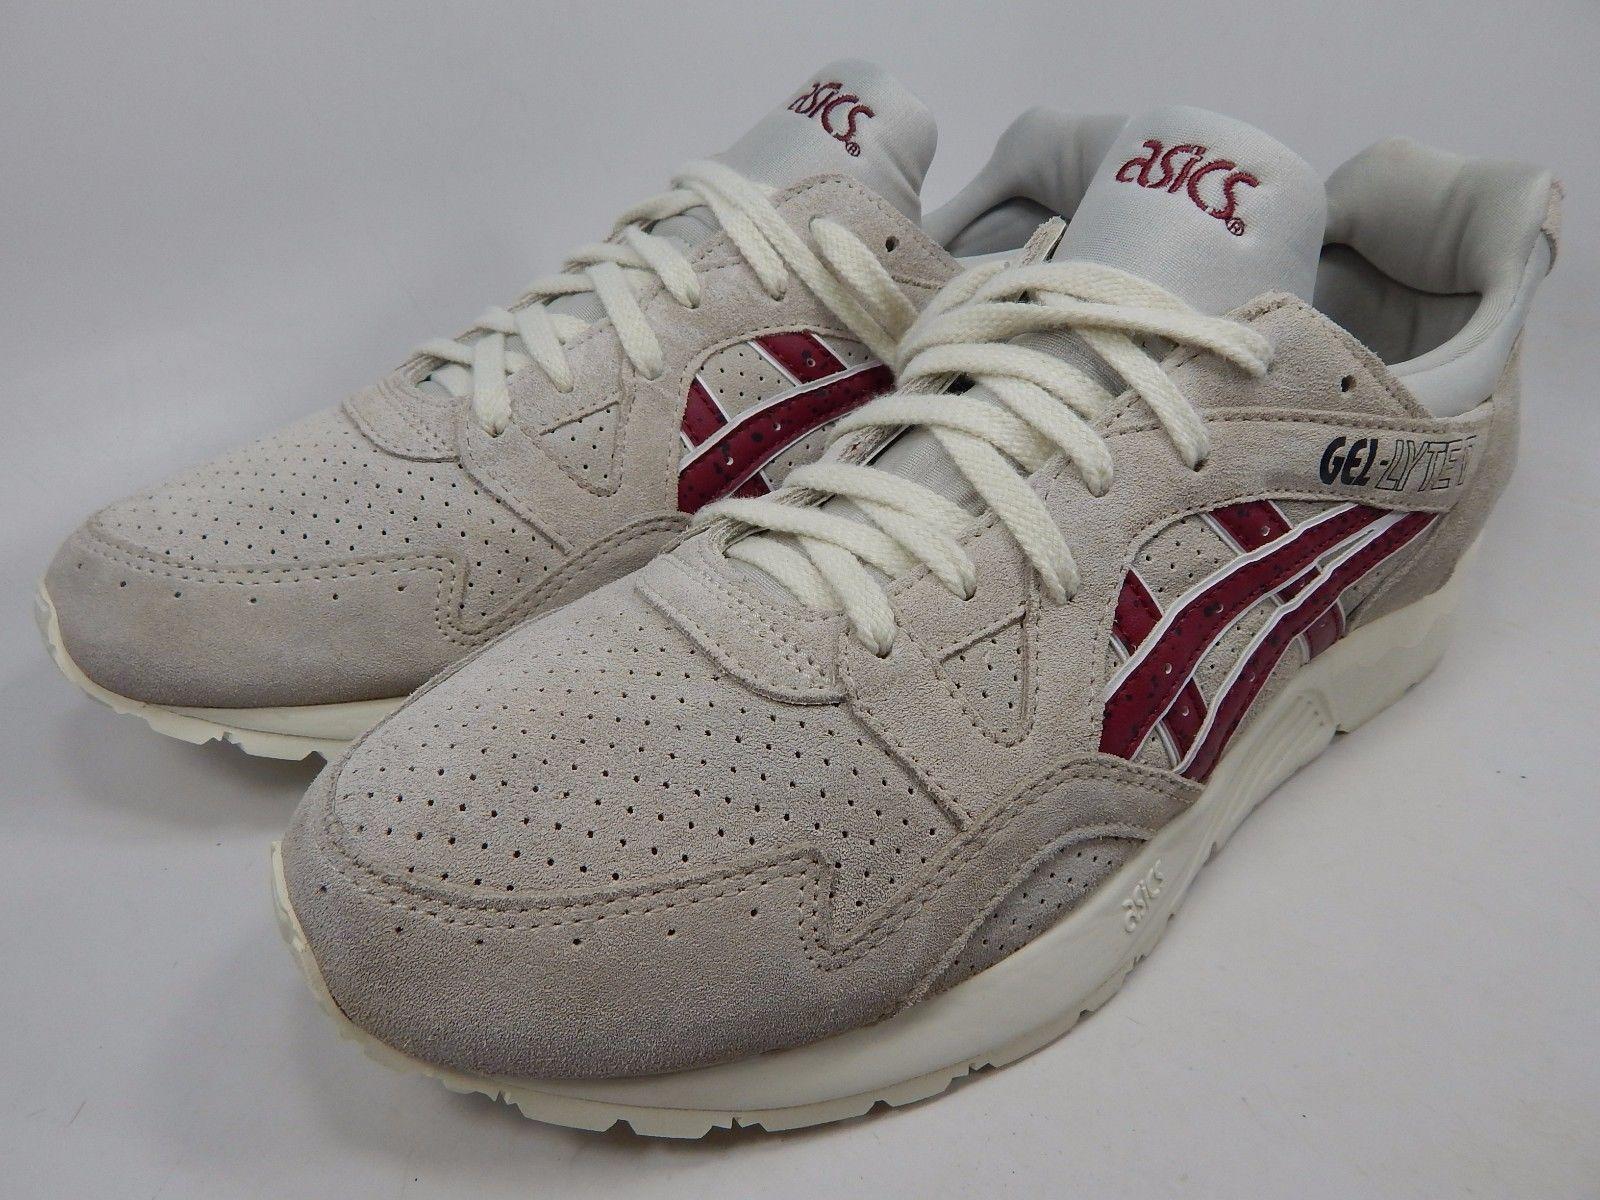 Asics Gel Lyte V Women's Running Shoes Size US 10.5 M (B) EU 43.5 Beige H60CK